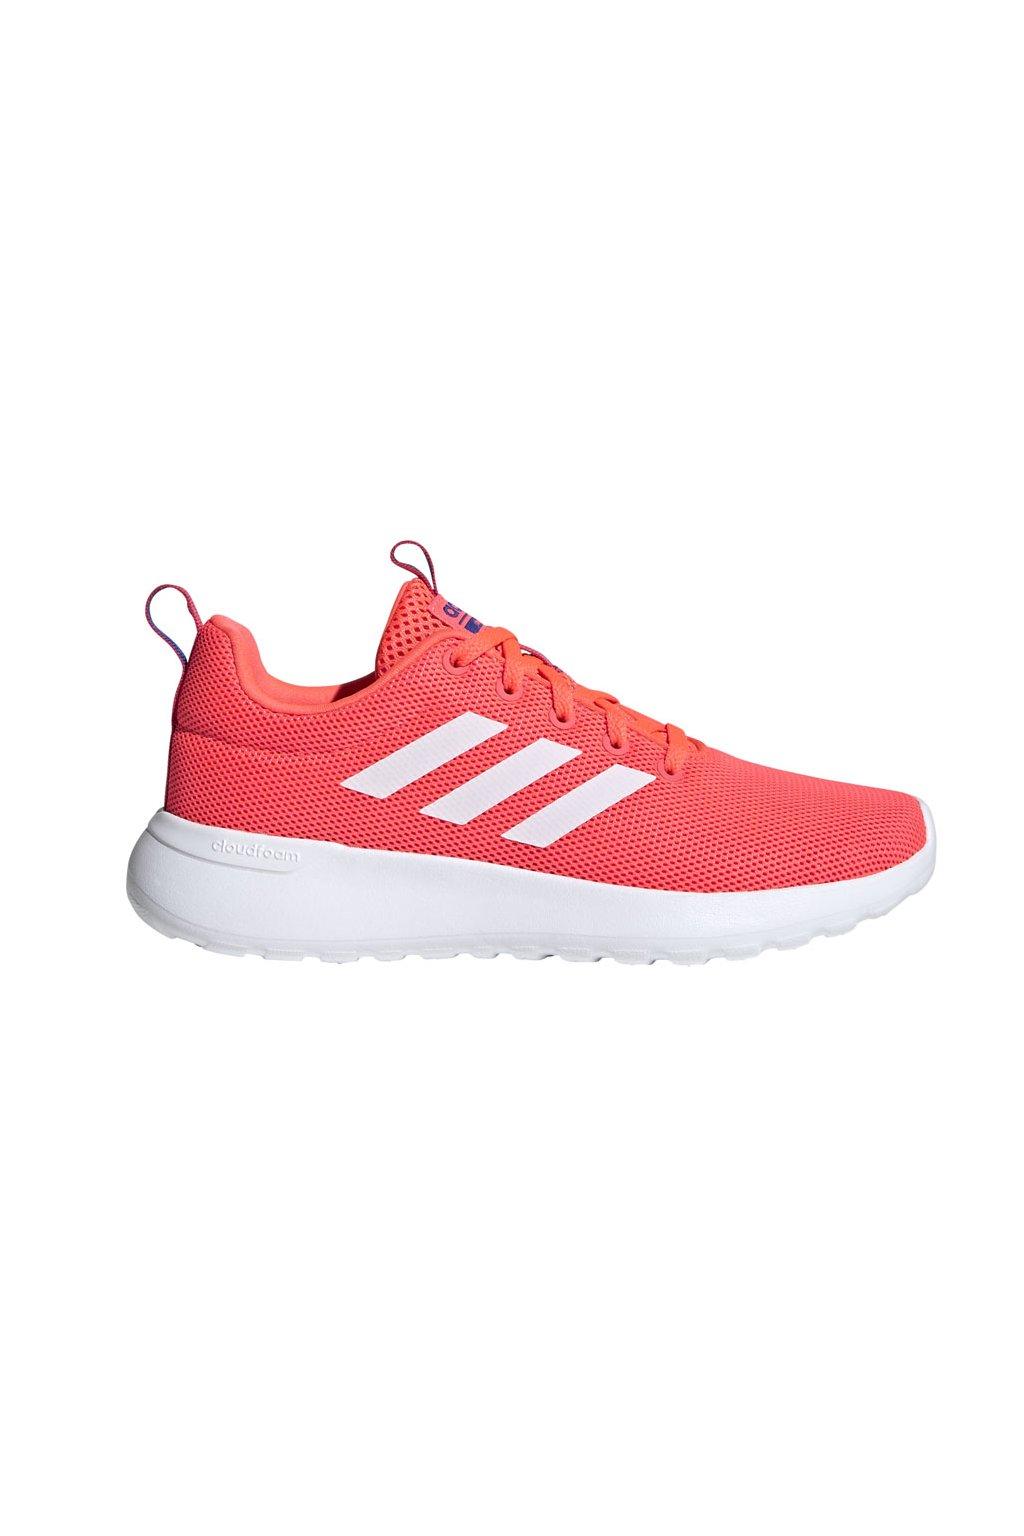 Detské topánky Adidas Lite Racer Cln K. ružové FV9609